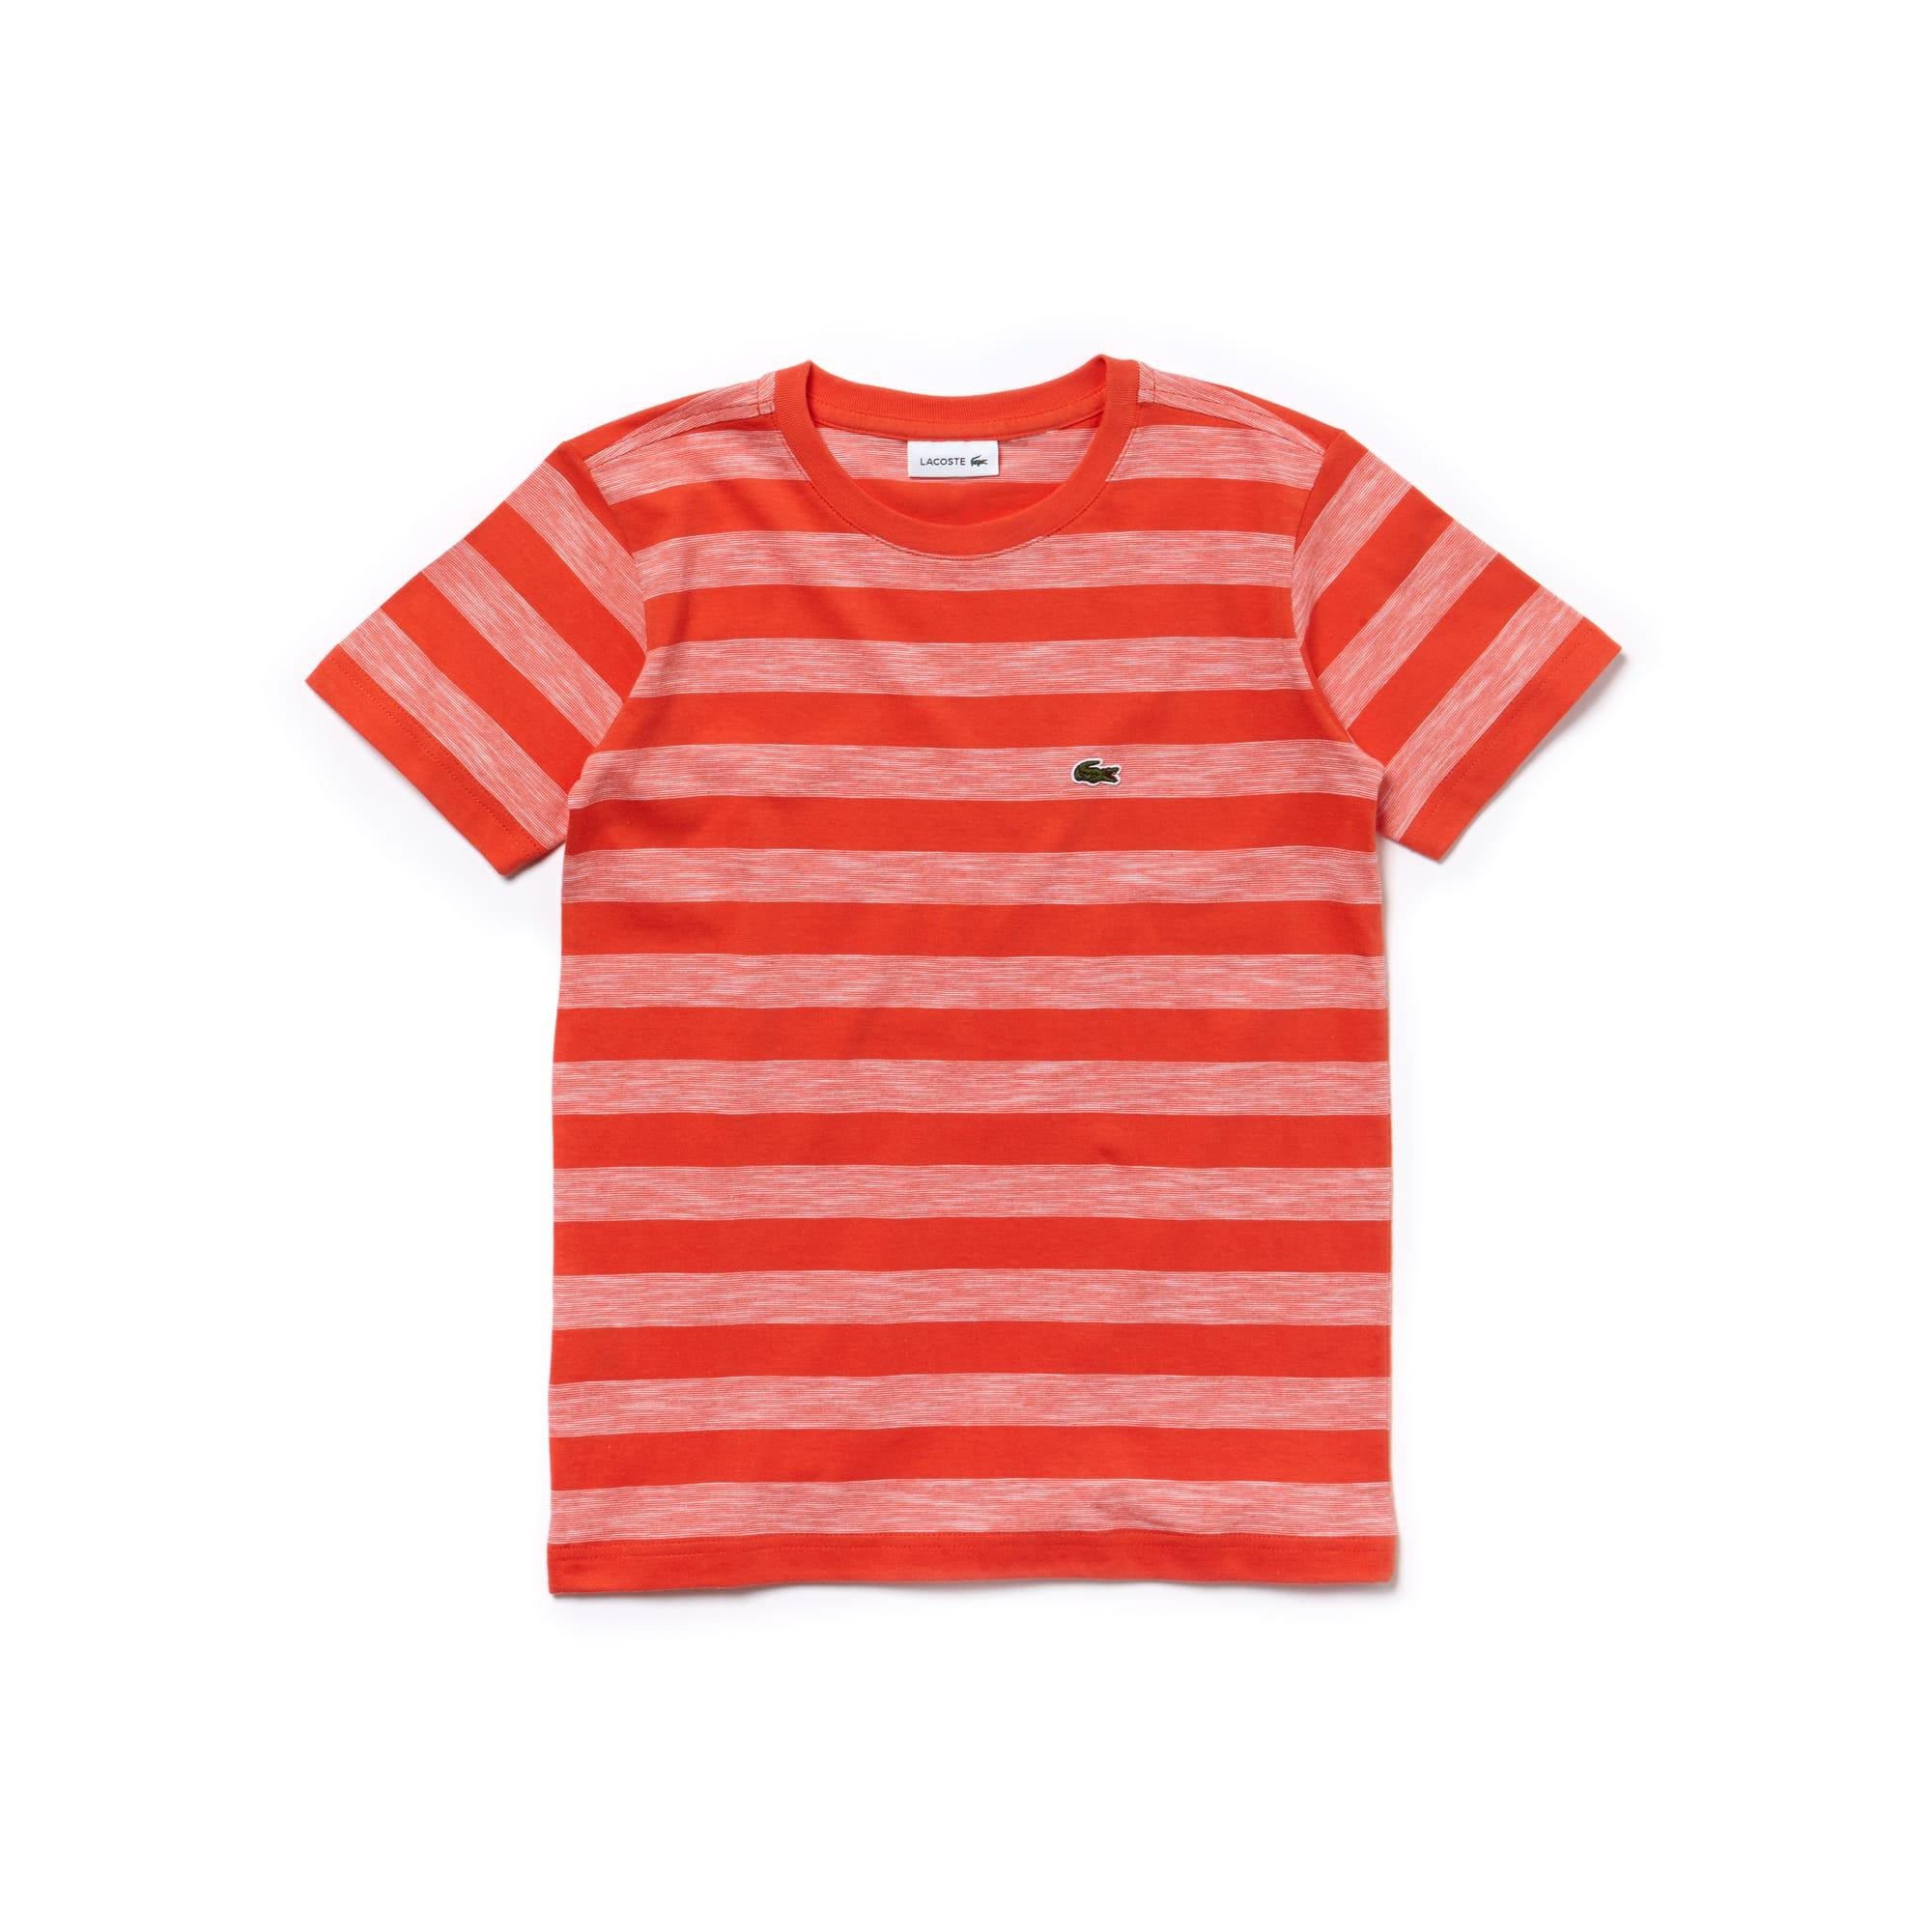 Boys' Crew Neck Striped Cotton Jersey T-shirt